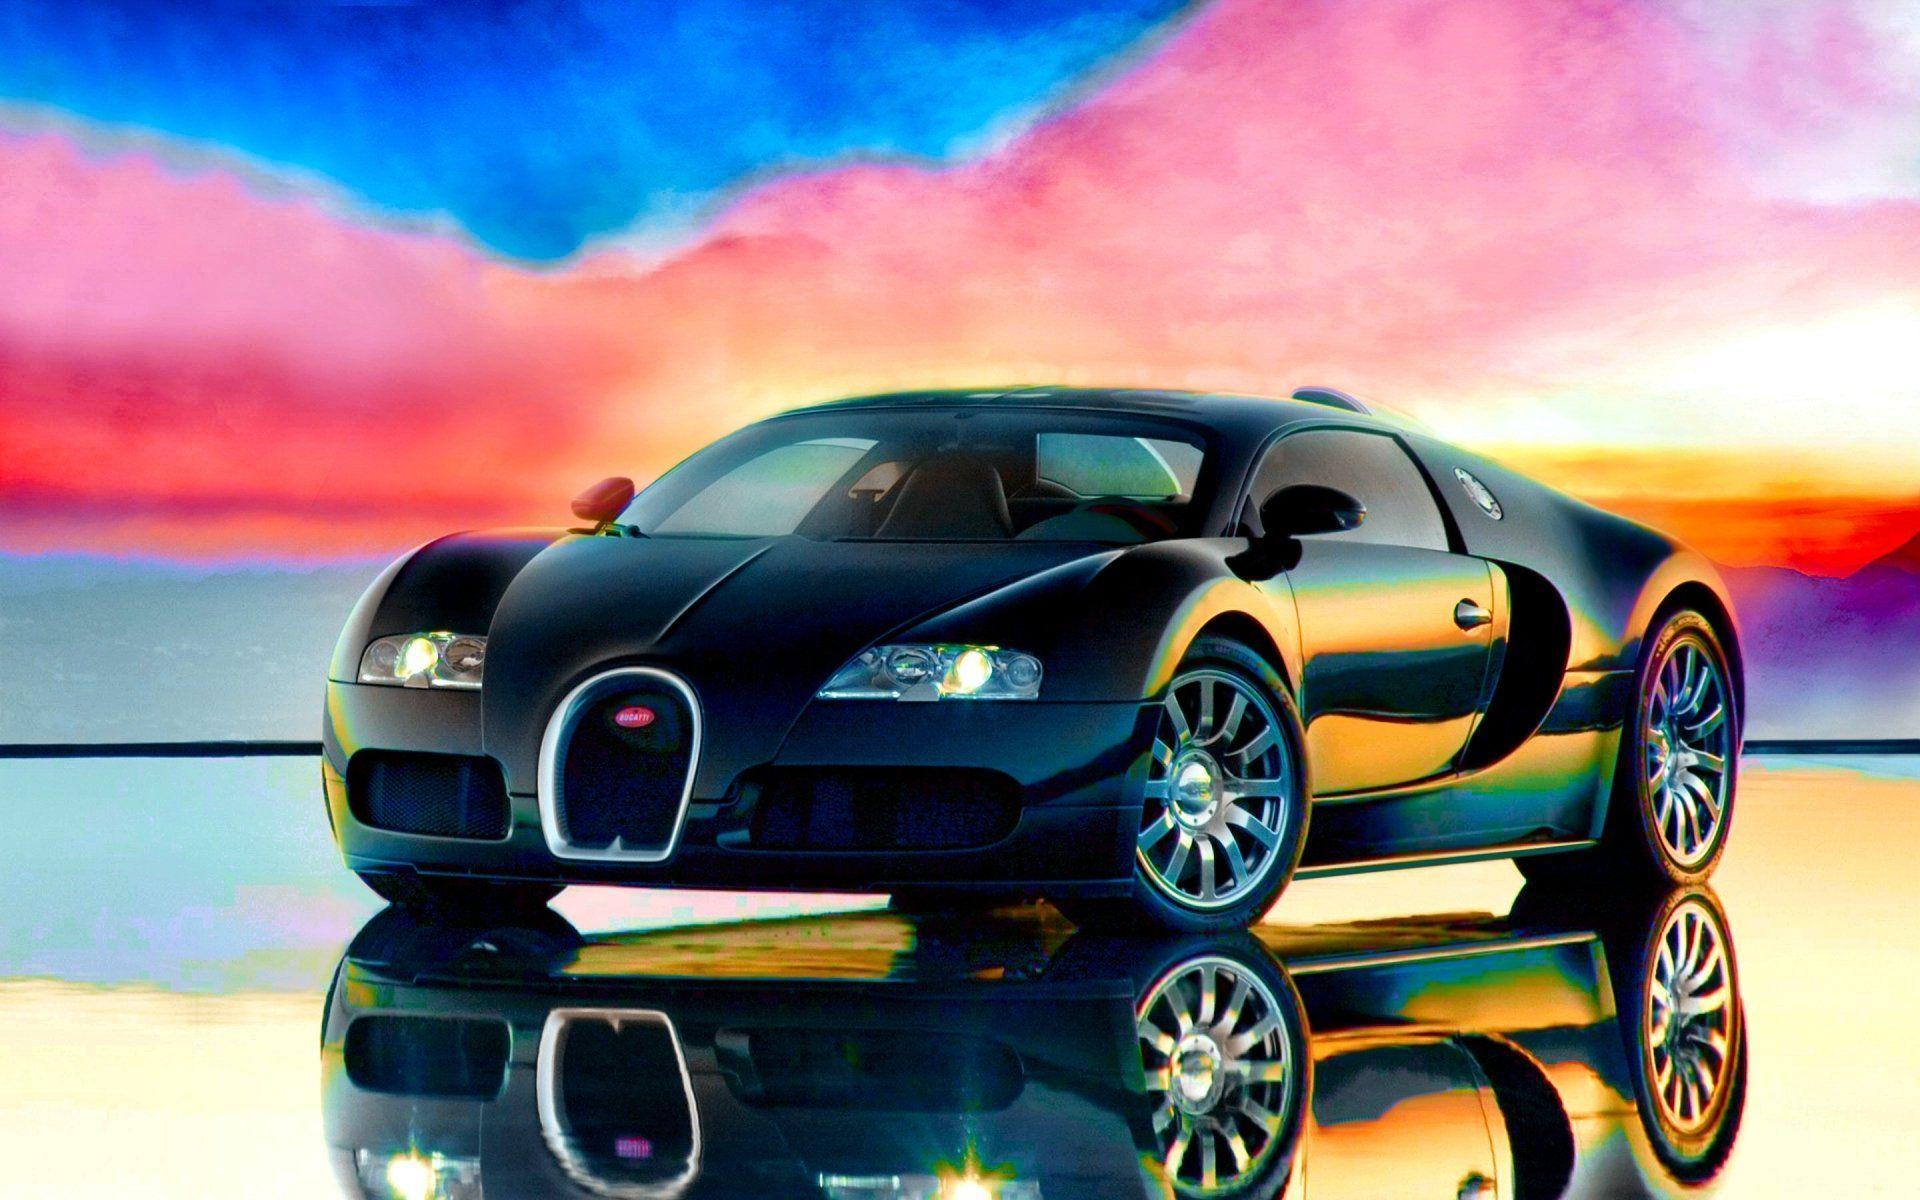 Bugatti Car Wallpapers Top Free Bugatti Car Backgrounds